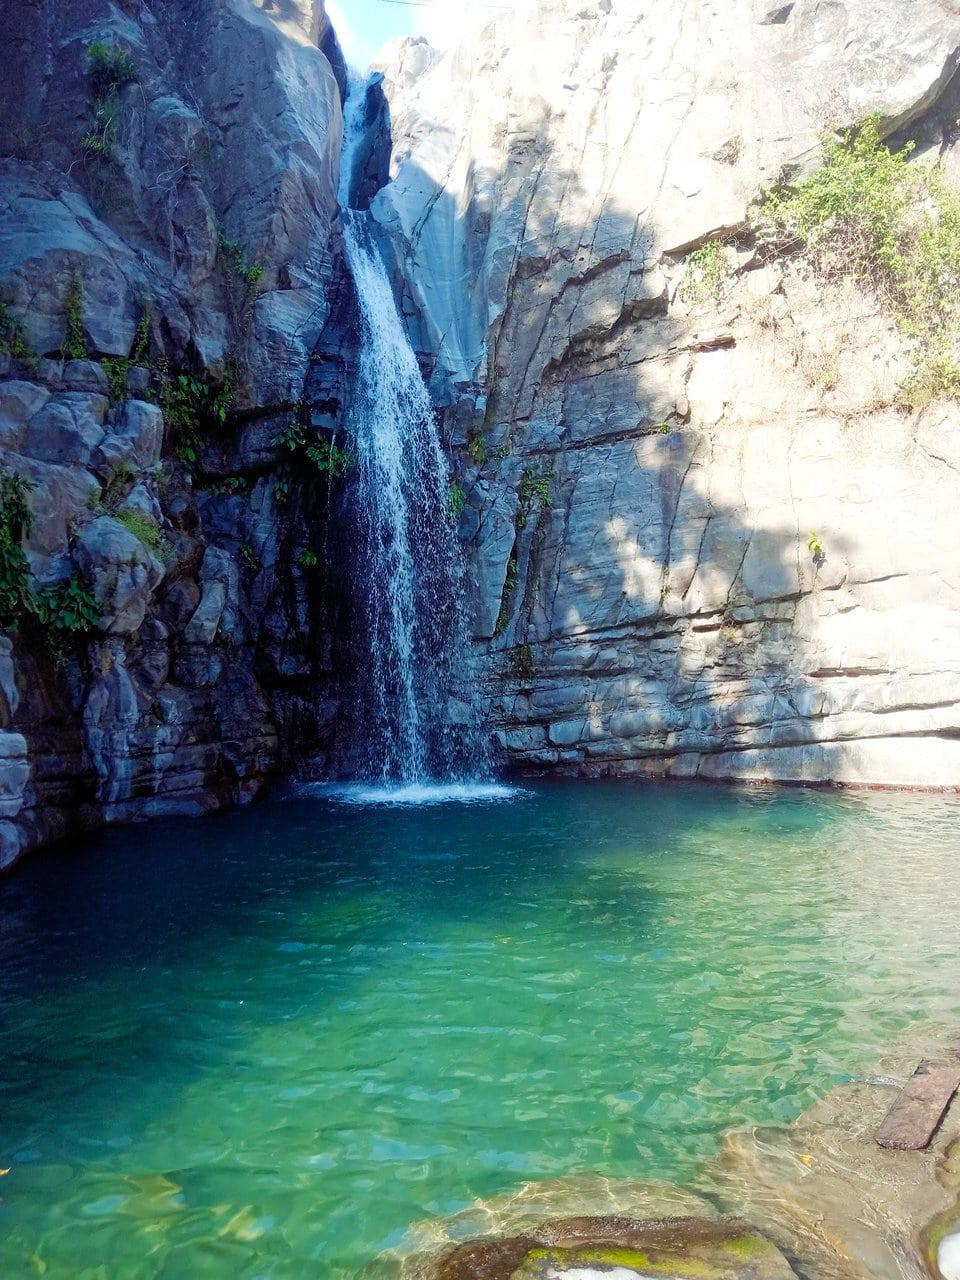 Bulalakaw Falls, things to do in La Union, La Union tourist spots